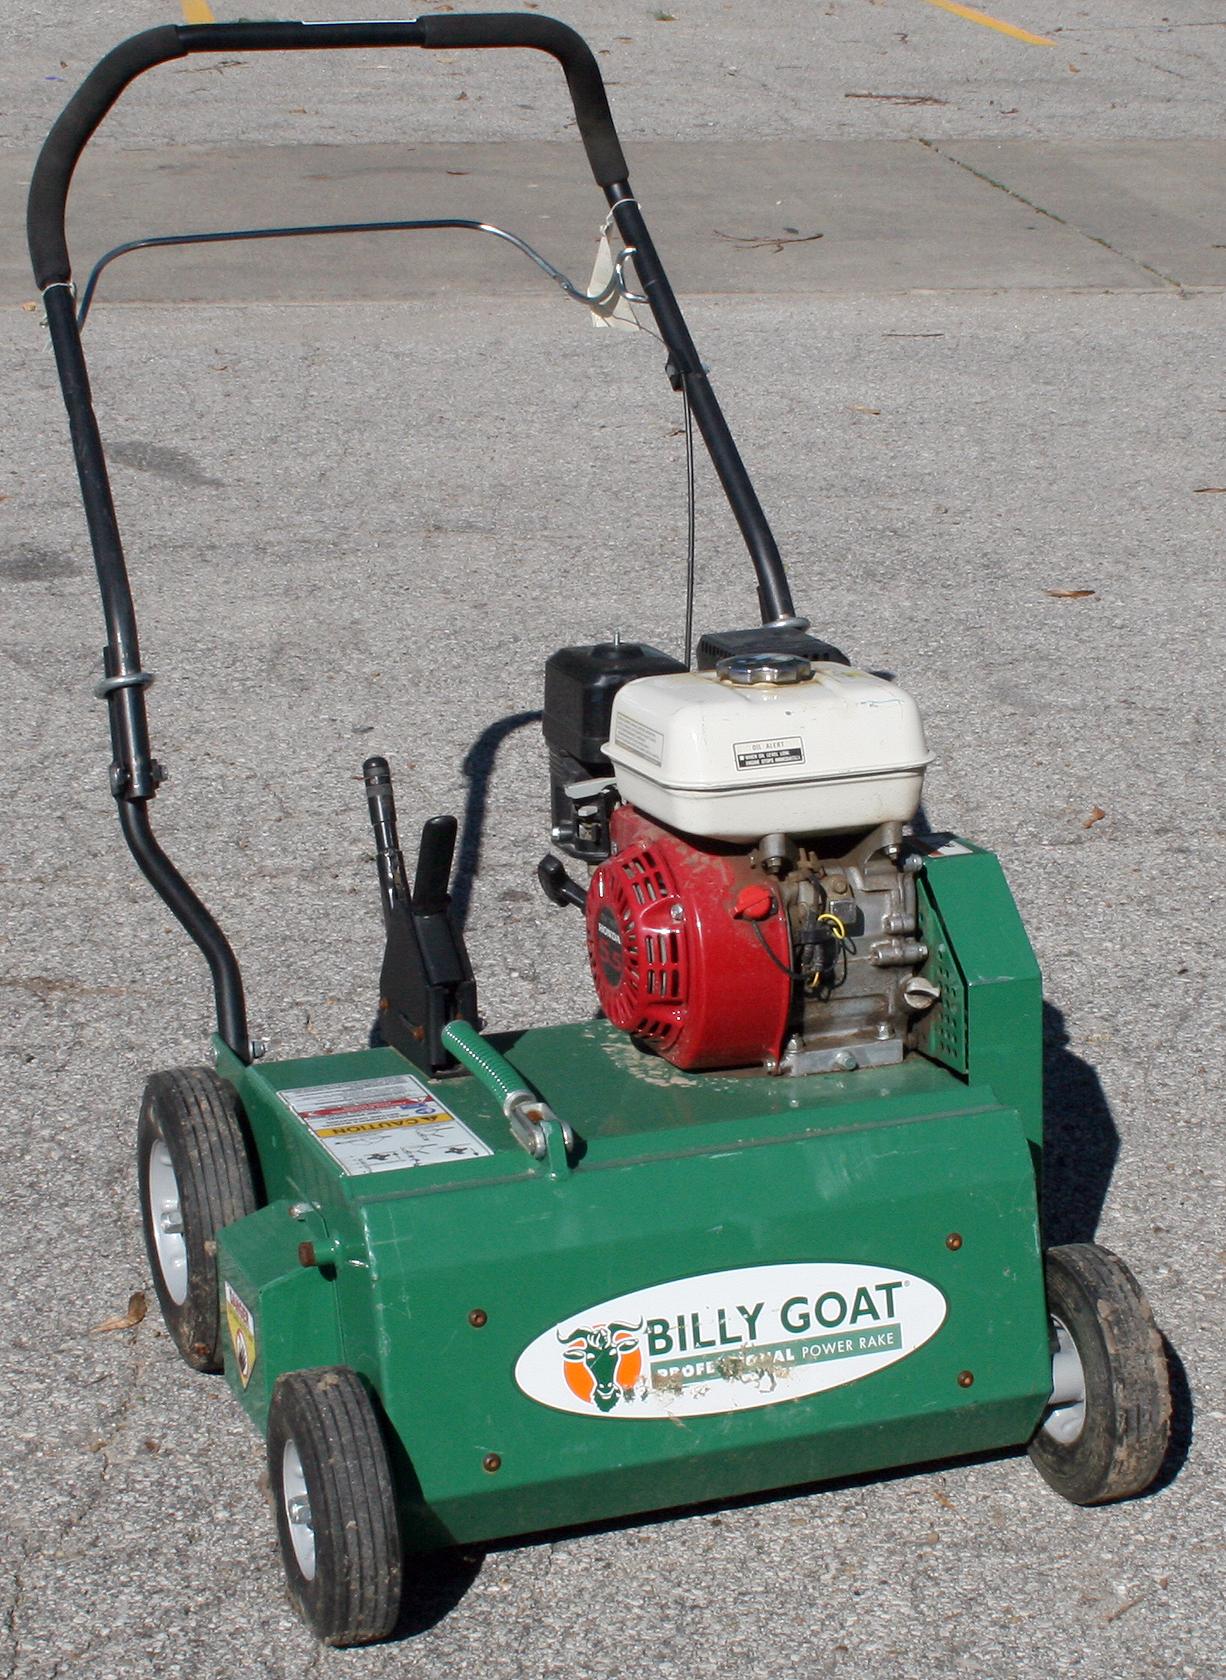 Lawn Garden Equipment Rentals The Home Depot Autos Post